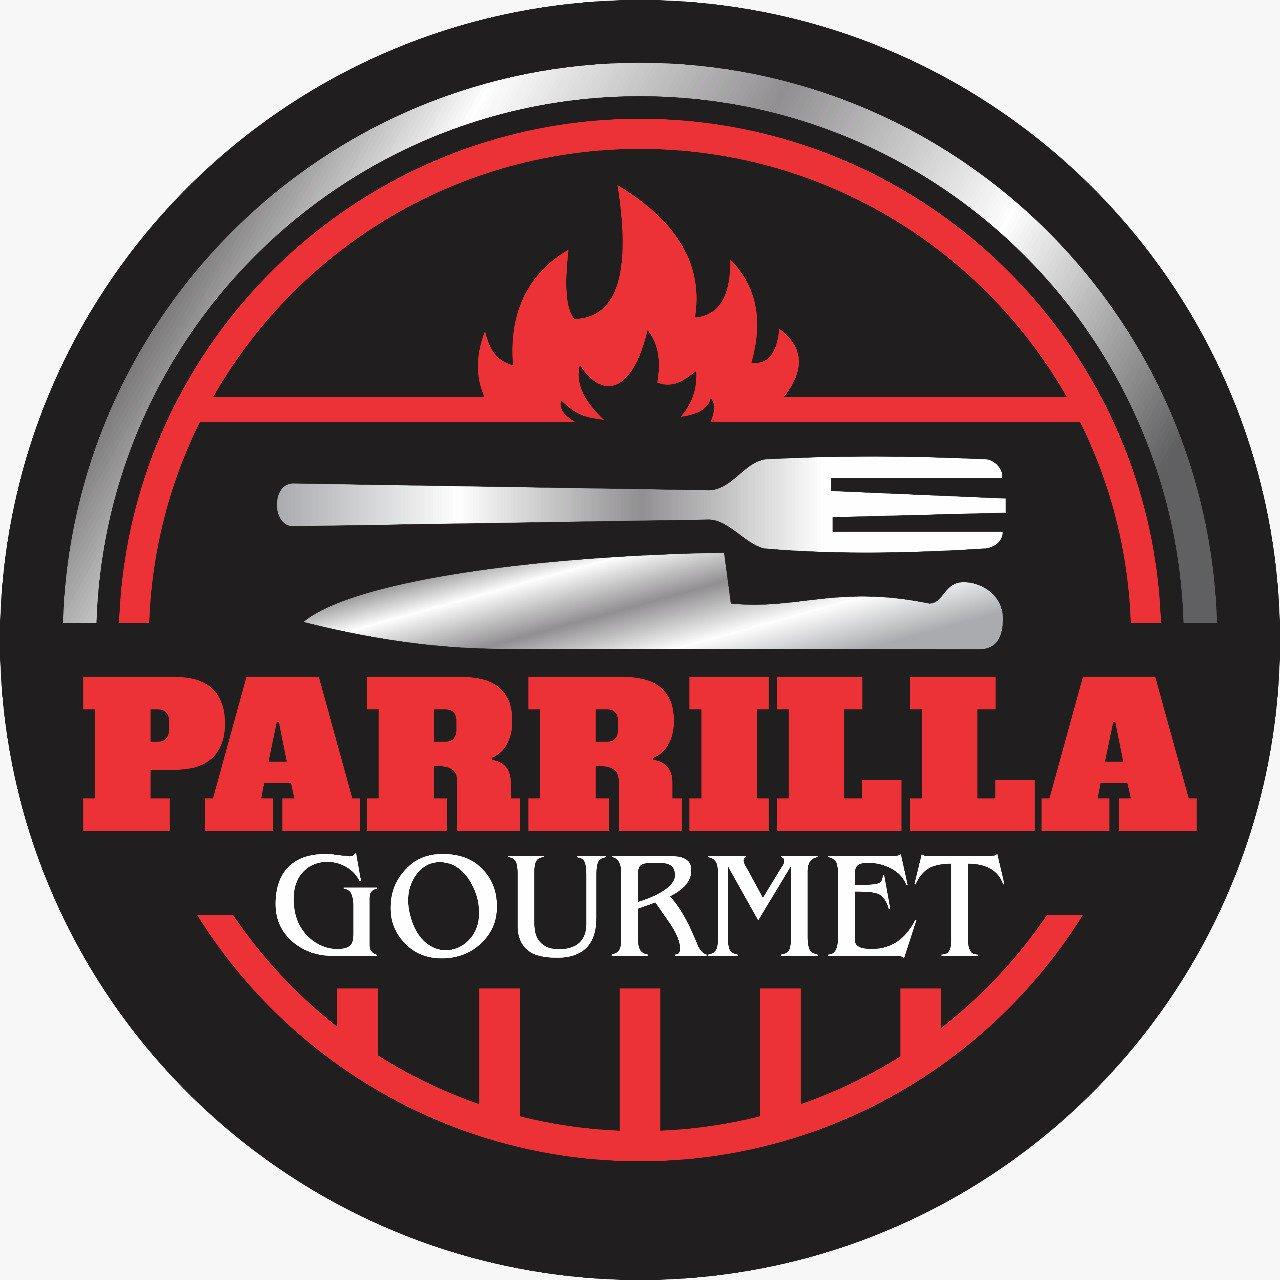 La Parrilla Gourmet Cartagena